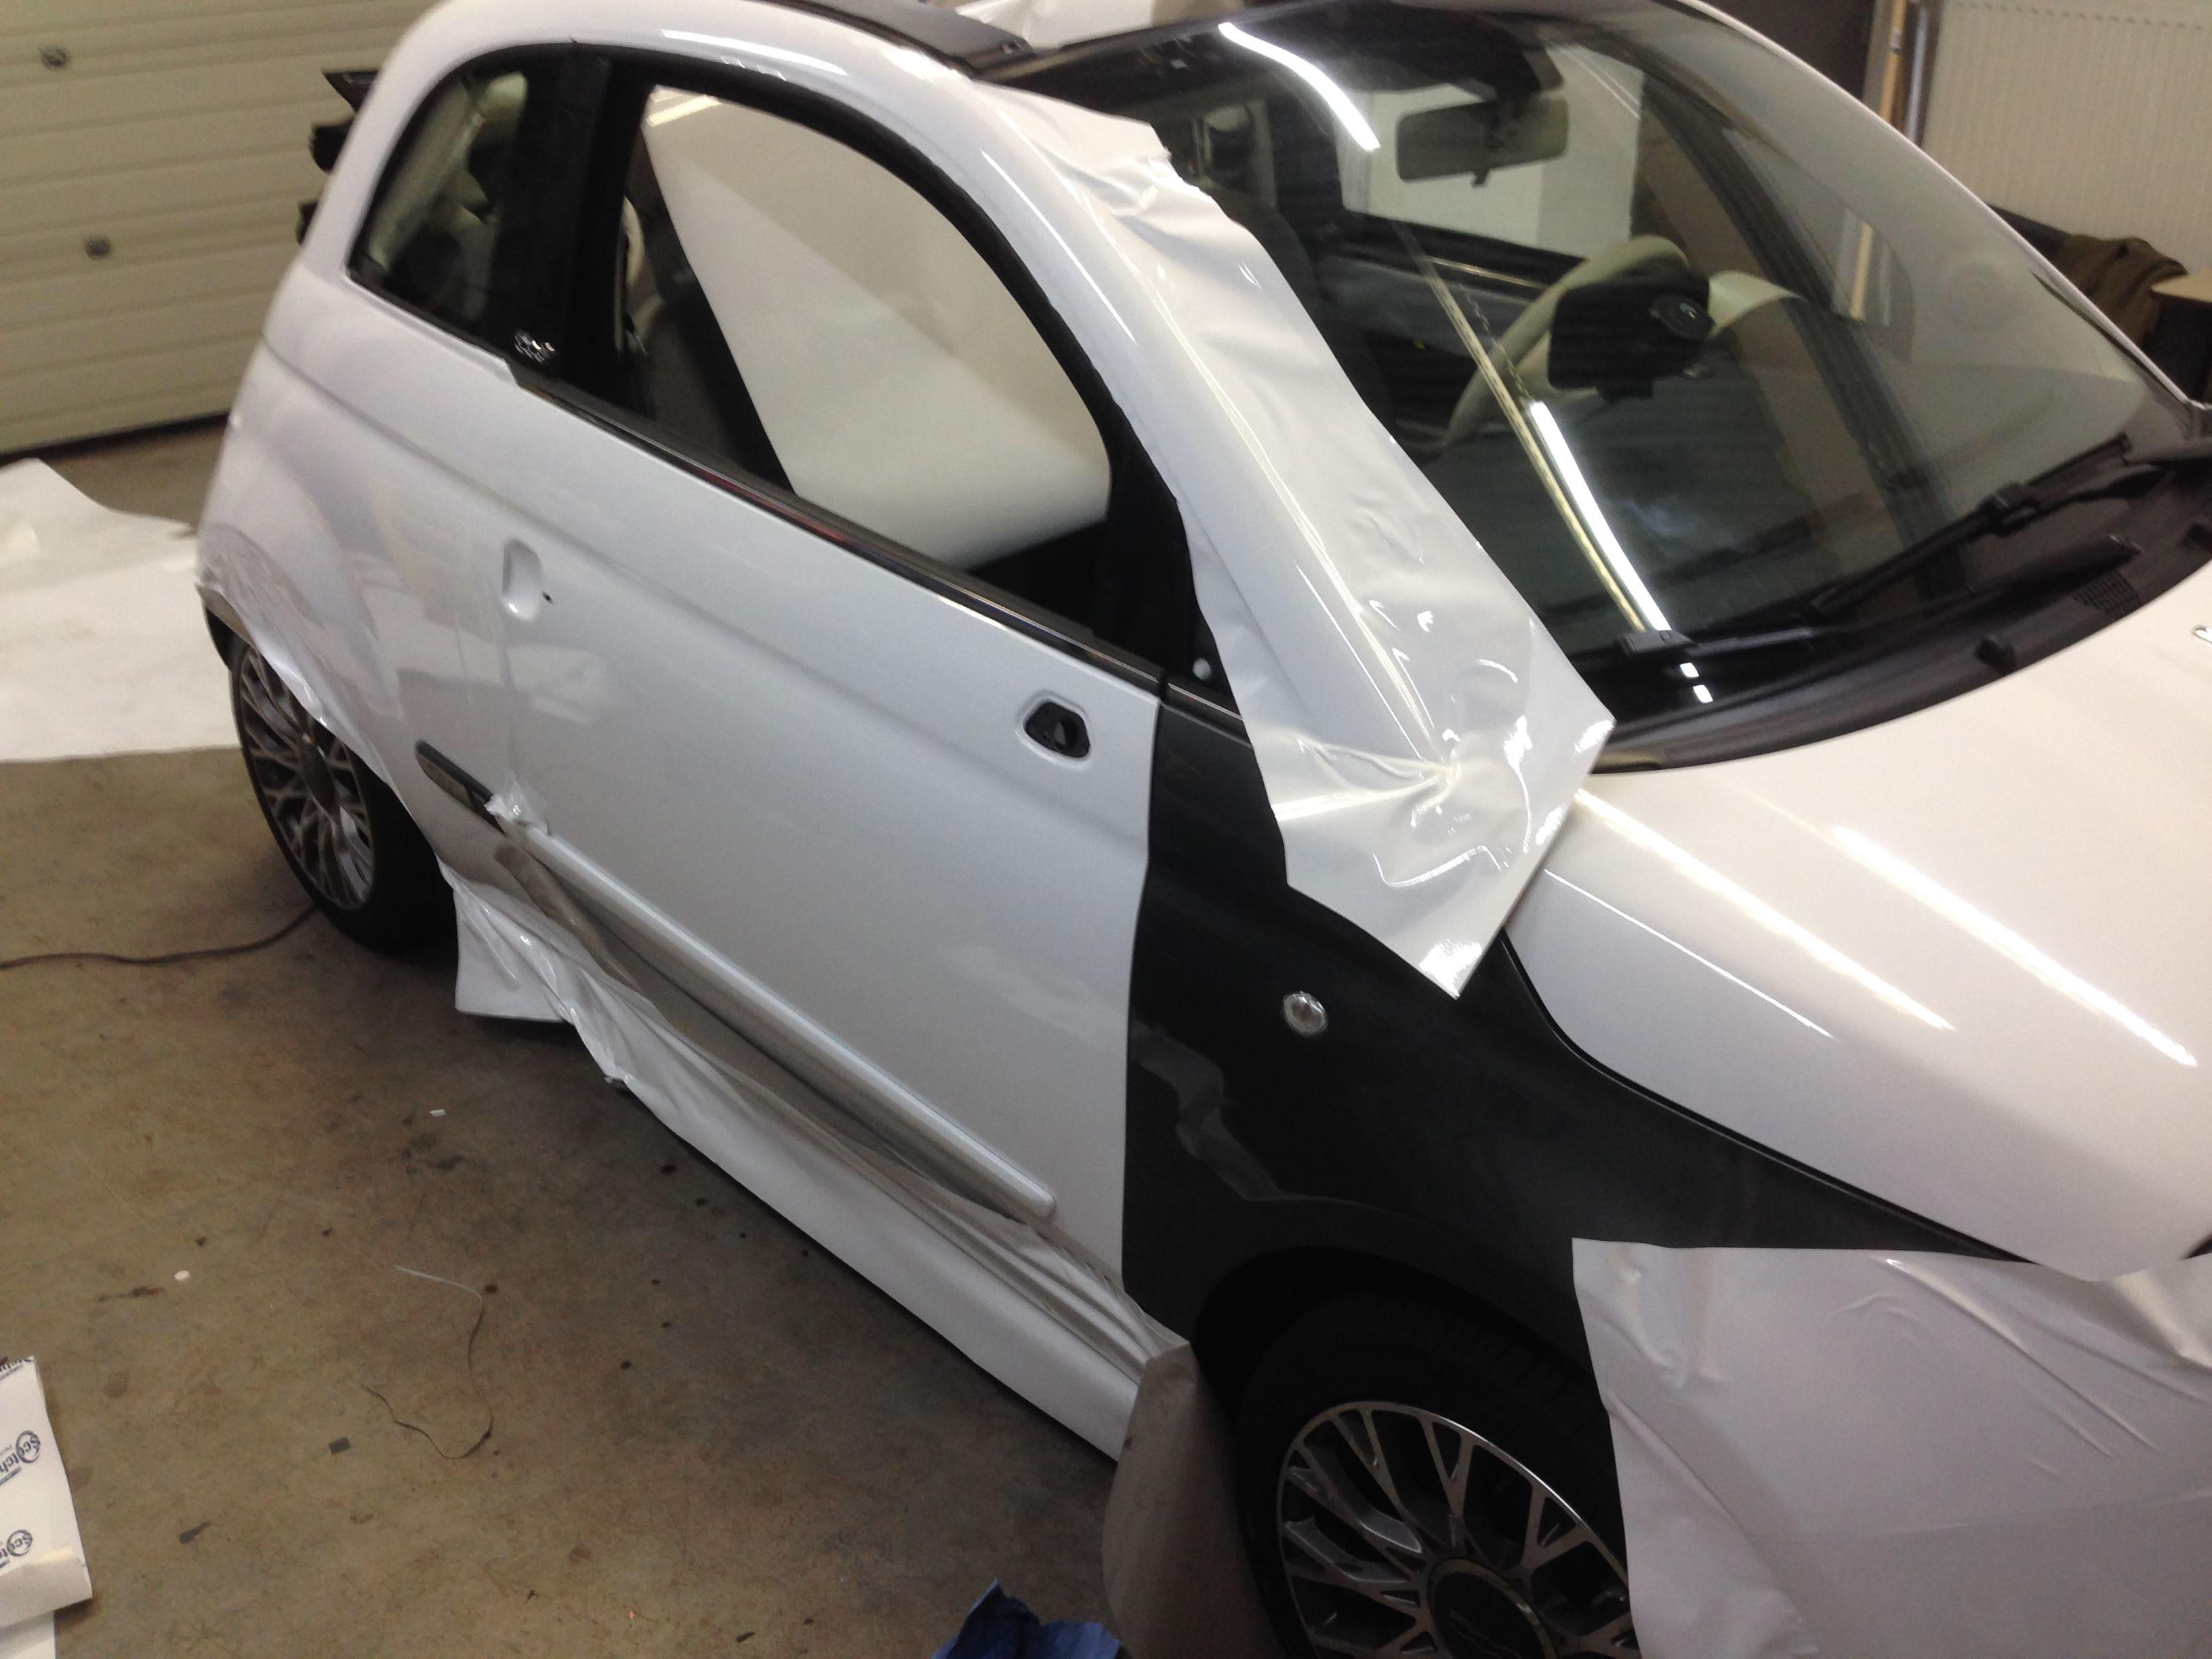 Fiat 500 met Glossy White Wrap, Carwrapping door Wrapmyride.nu Foto-nr:5725, ©2020